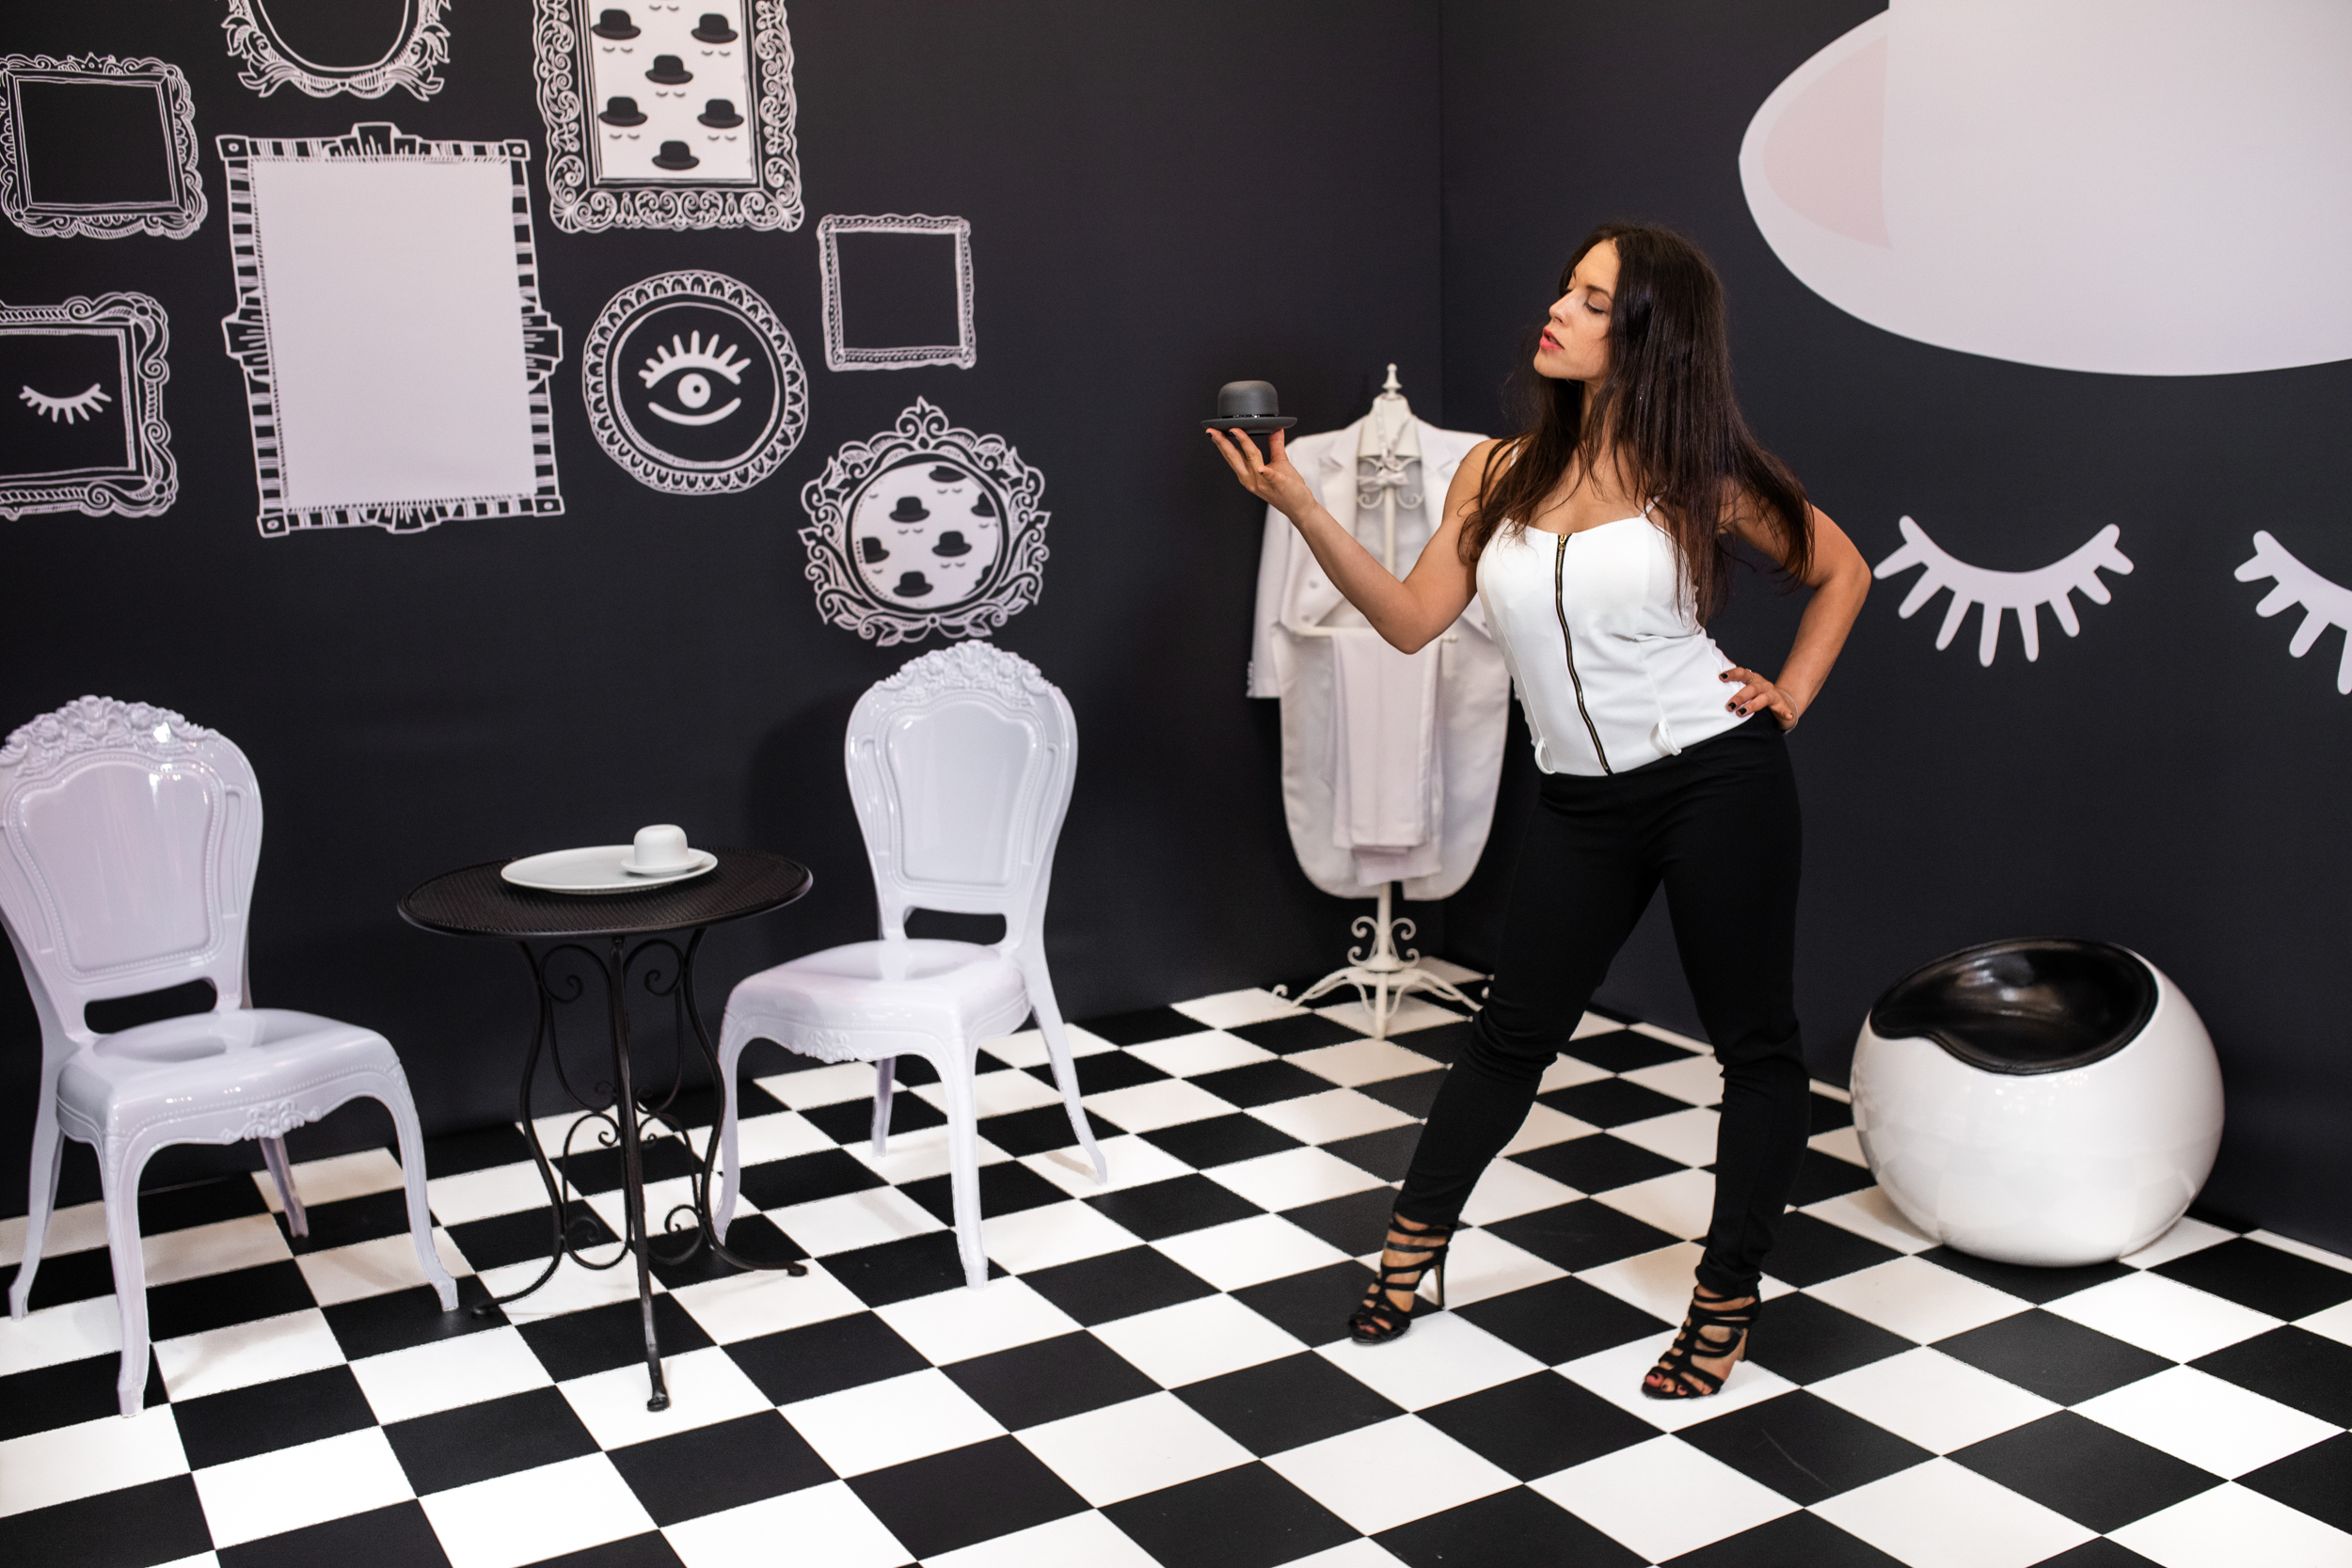 Black White Portfolio Konzept Art 2 1  Tee Zeit - Fotografie Konzept